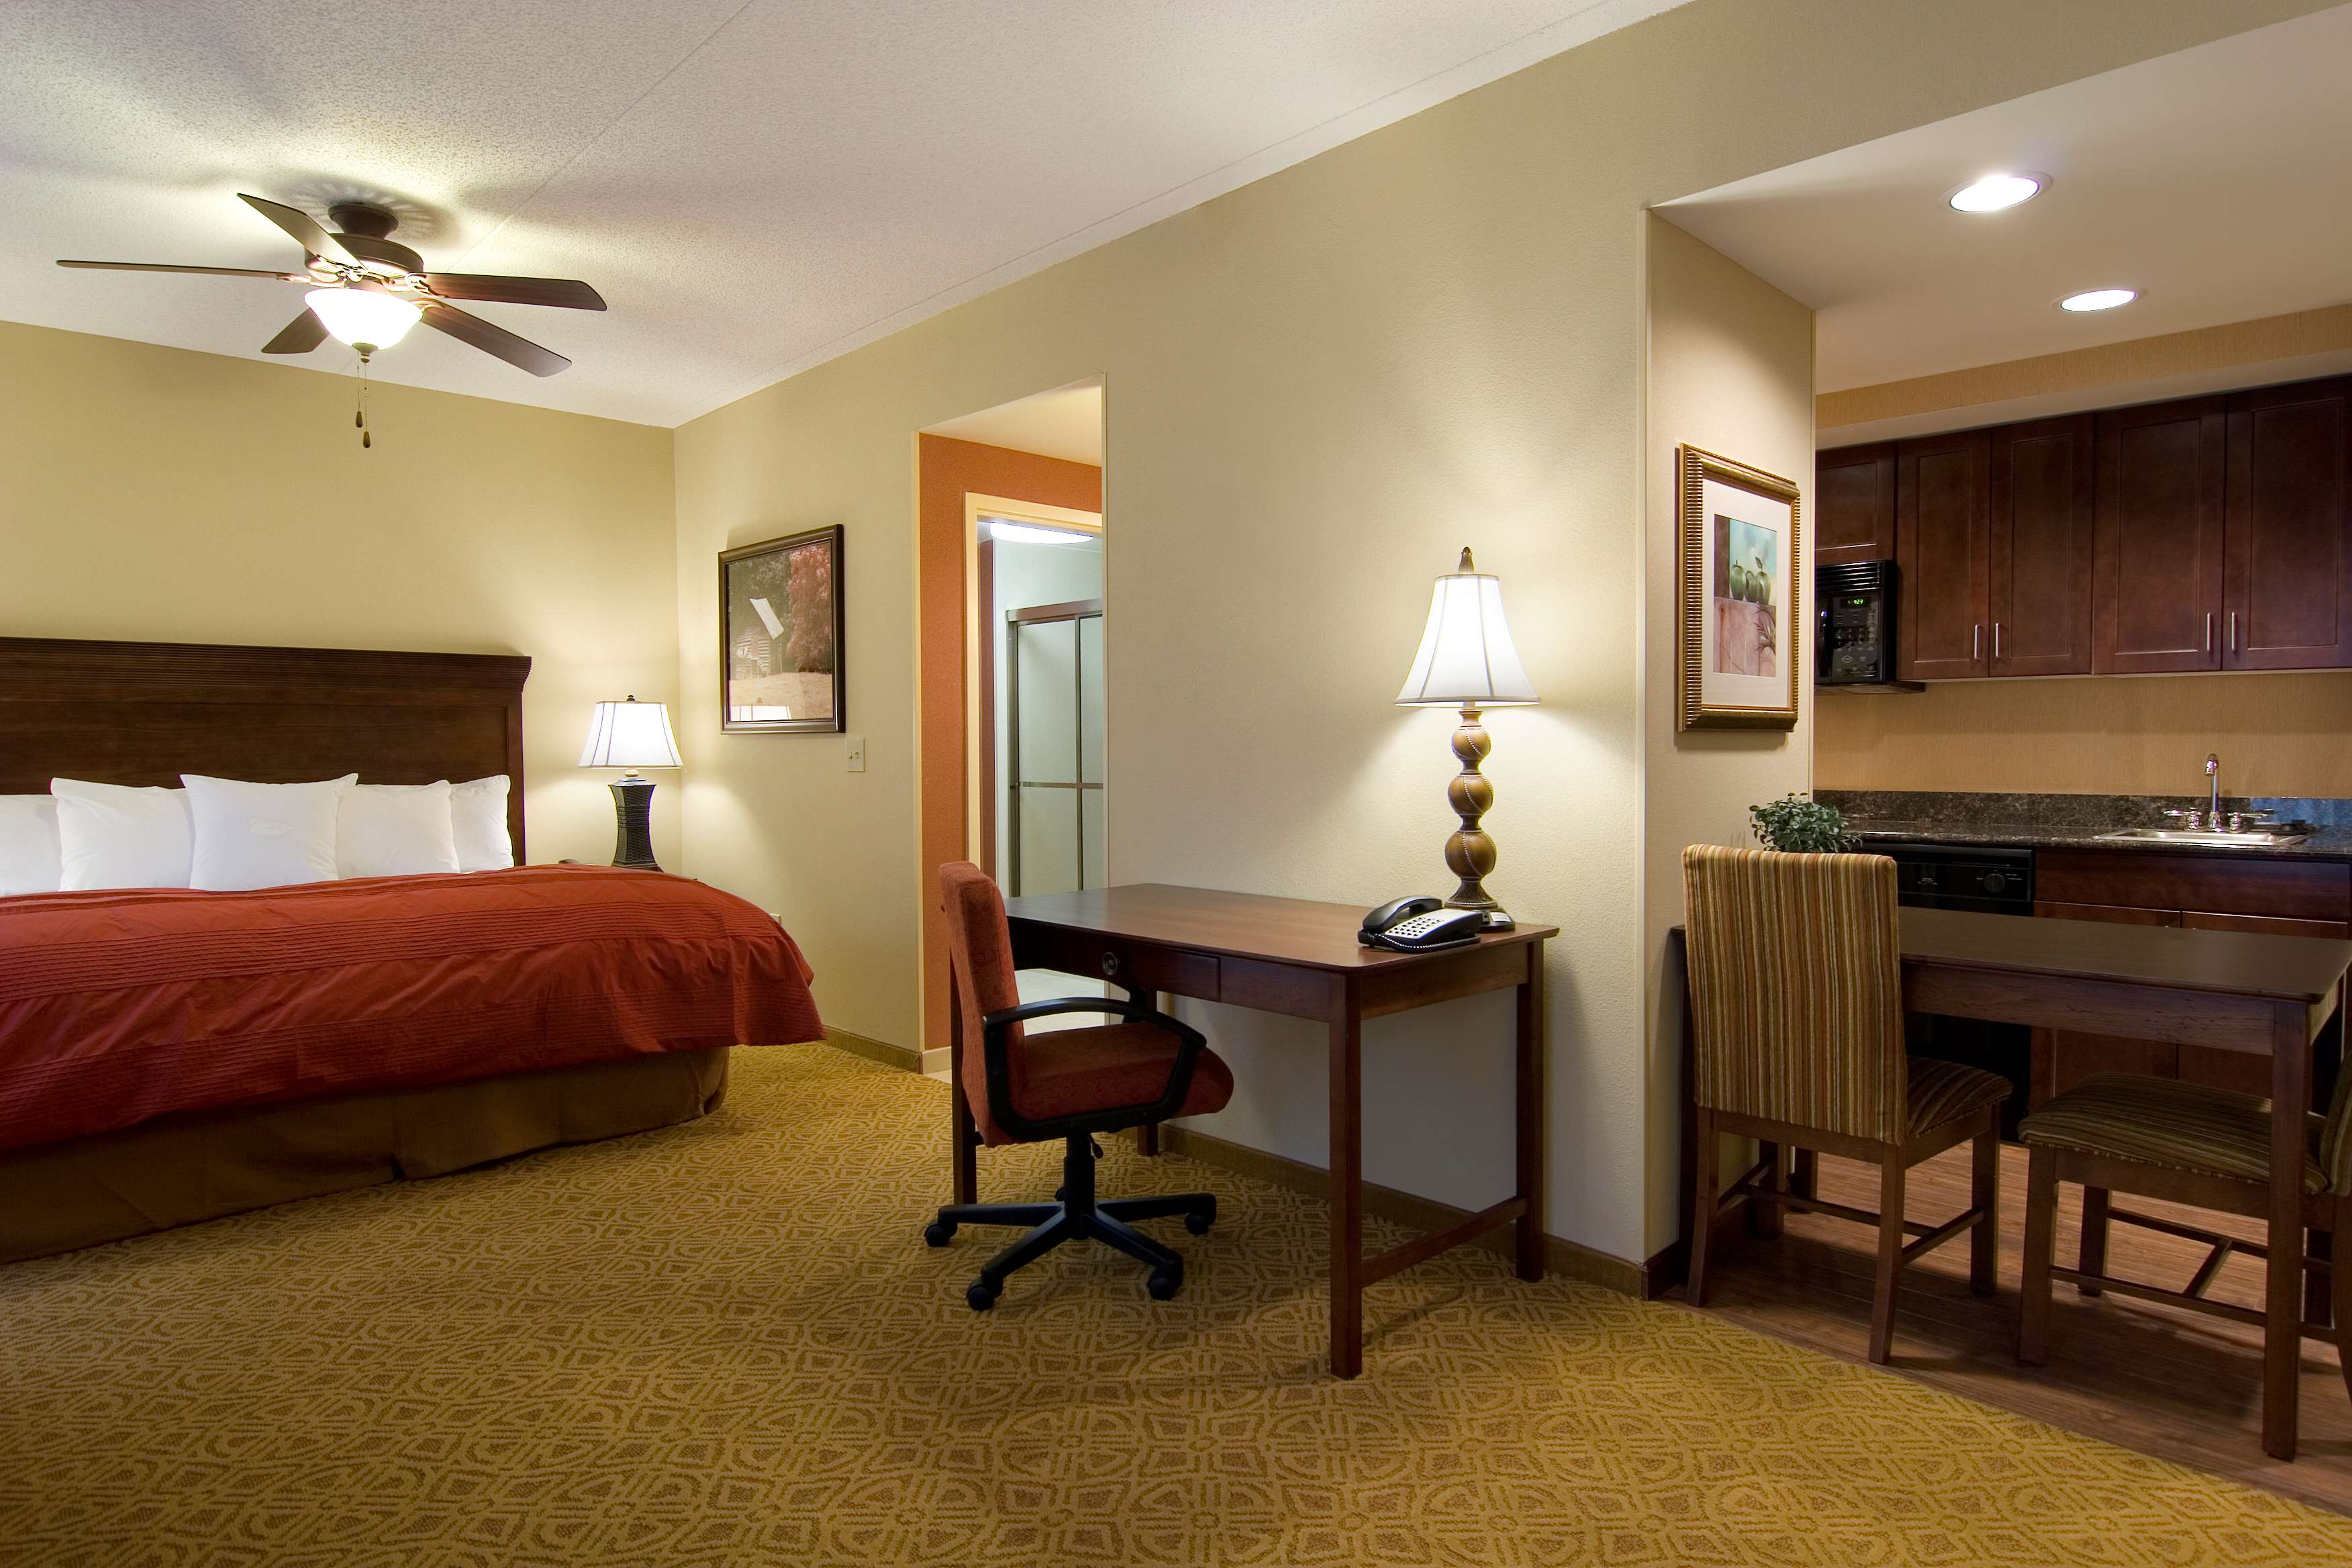 Homewood Suites by Hilton Fredericksburg image 16